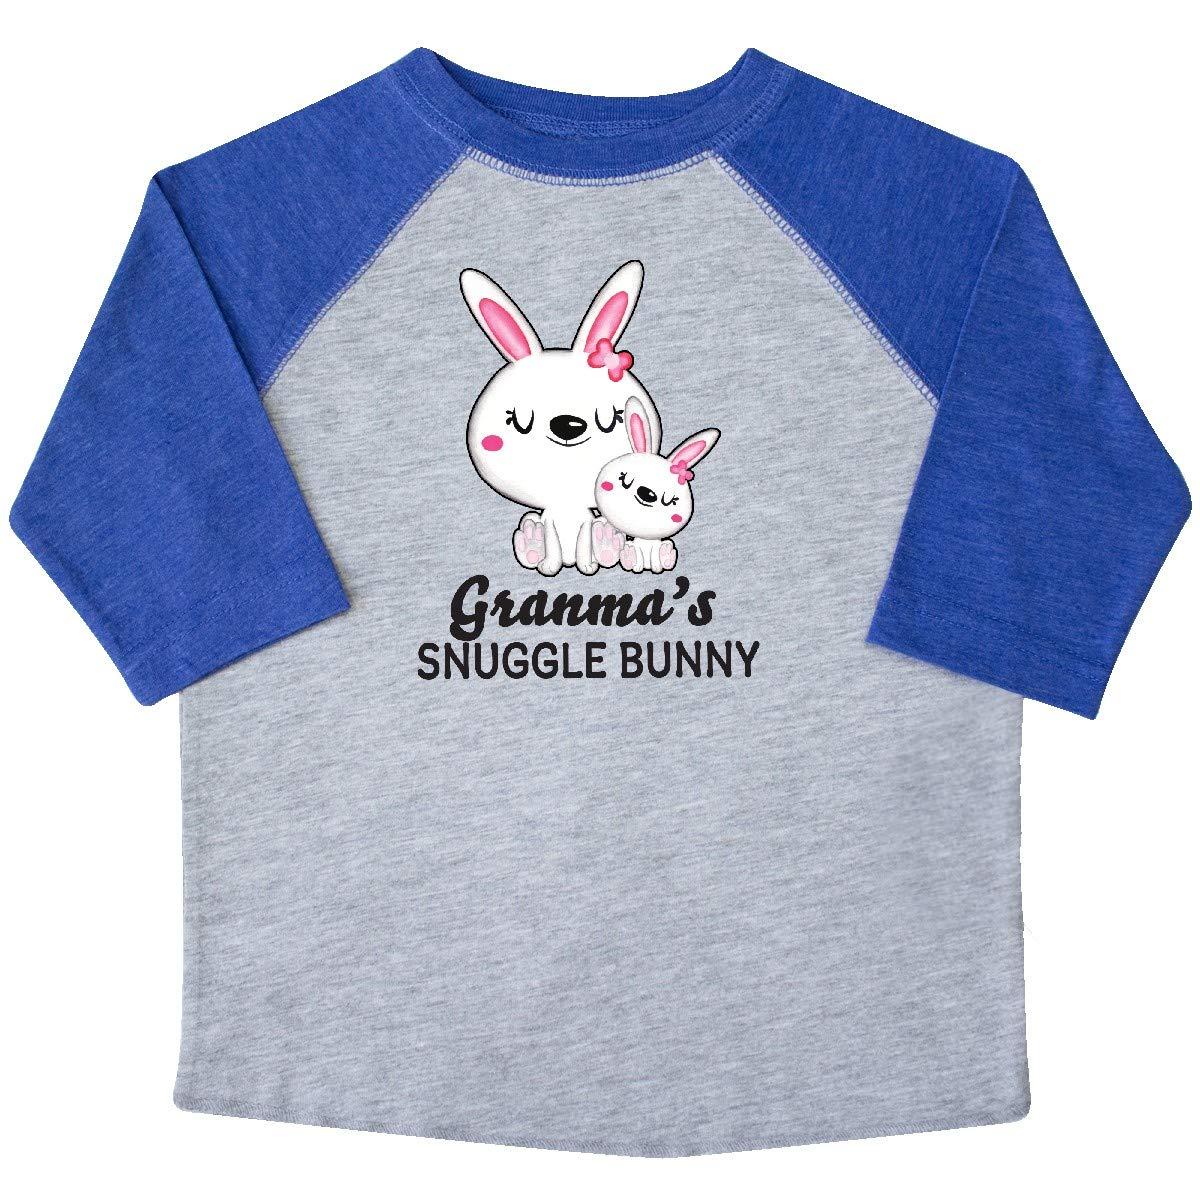 inktastic Granmas Snuggle Bunny Easter Toddler T-Shirt